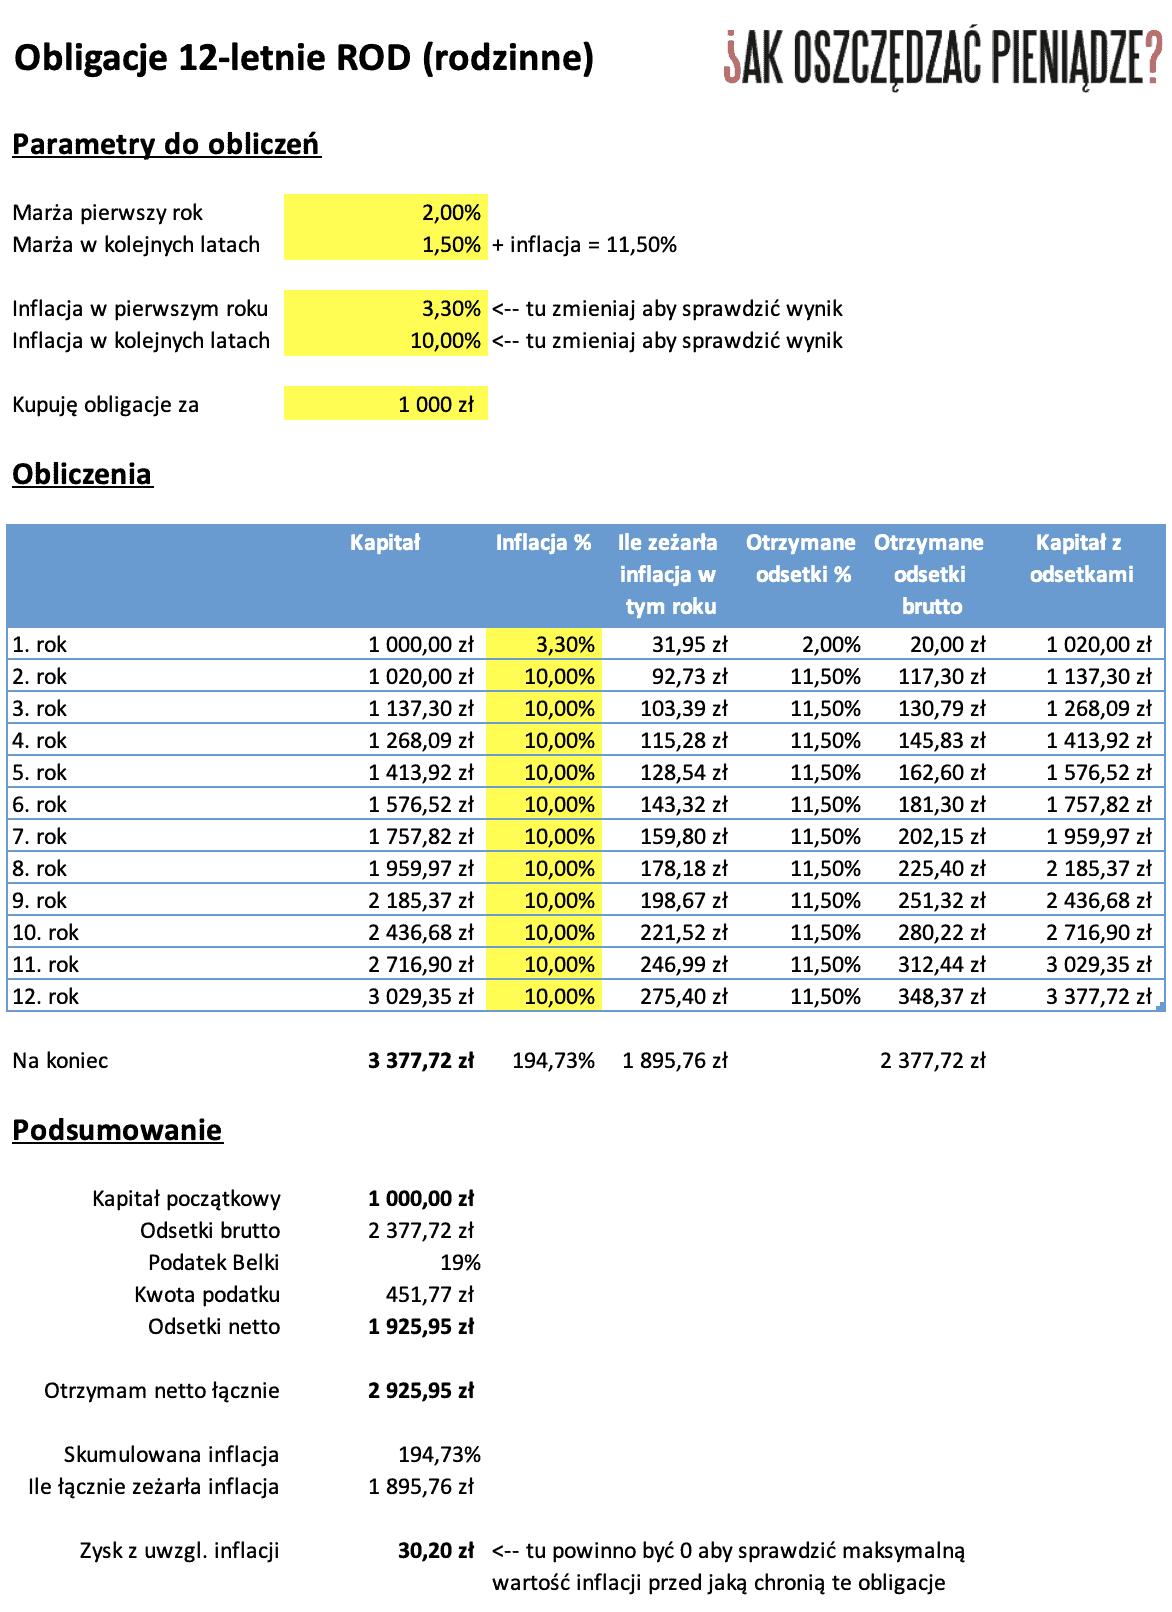 Obligacje 12-letnie ROD 2020